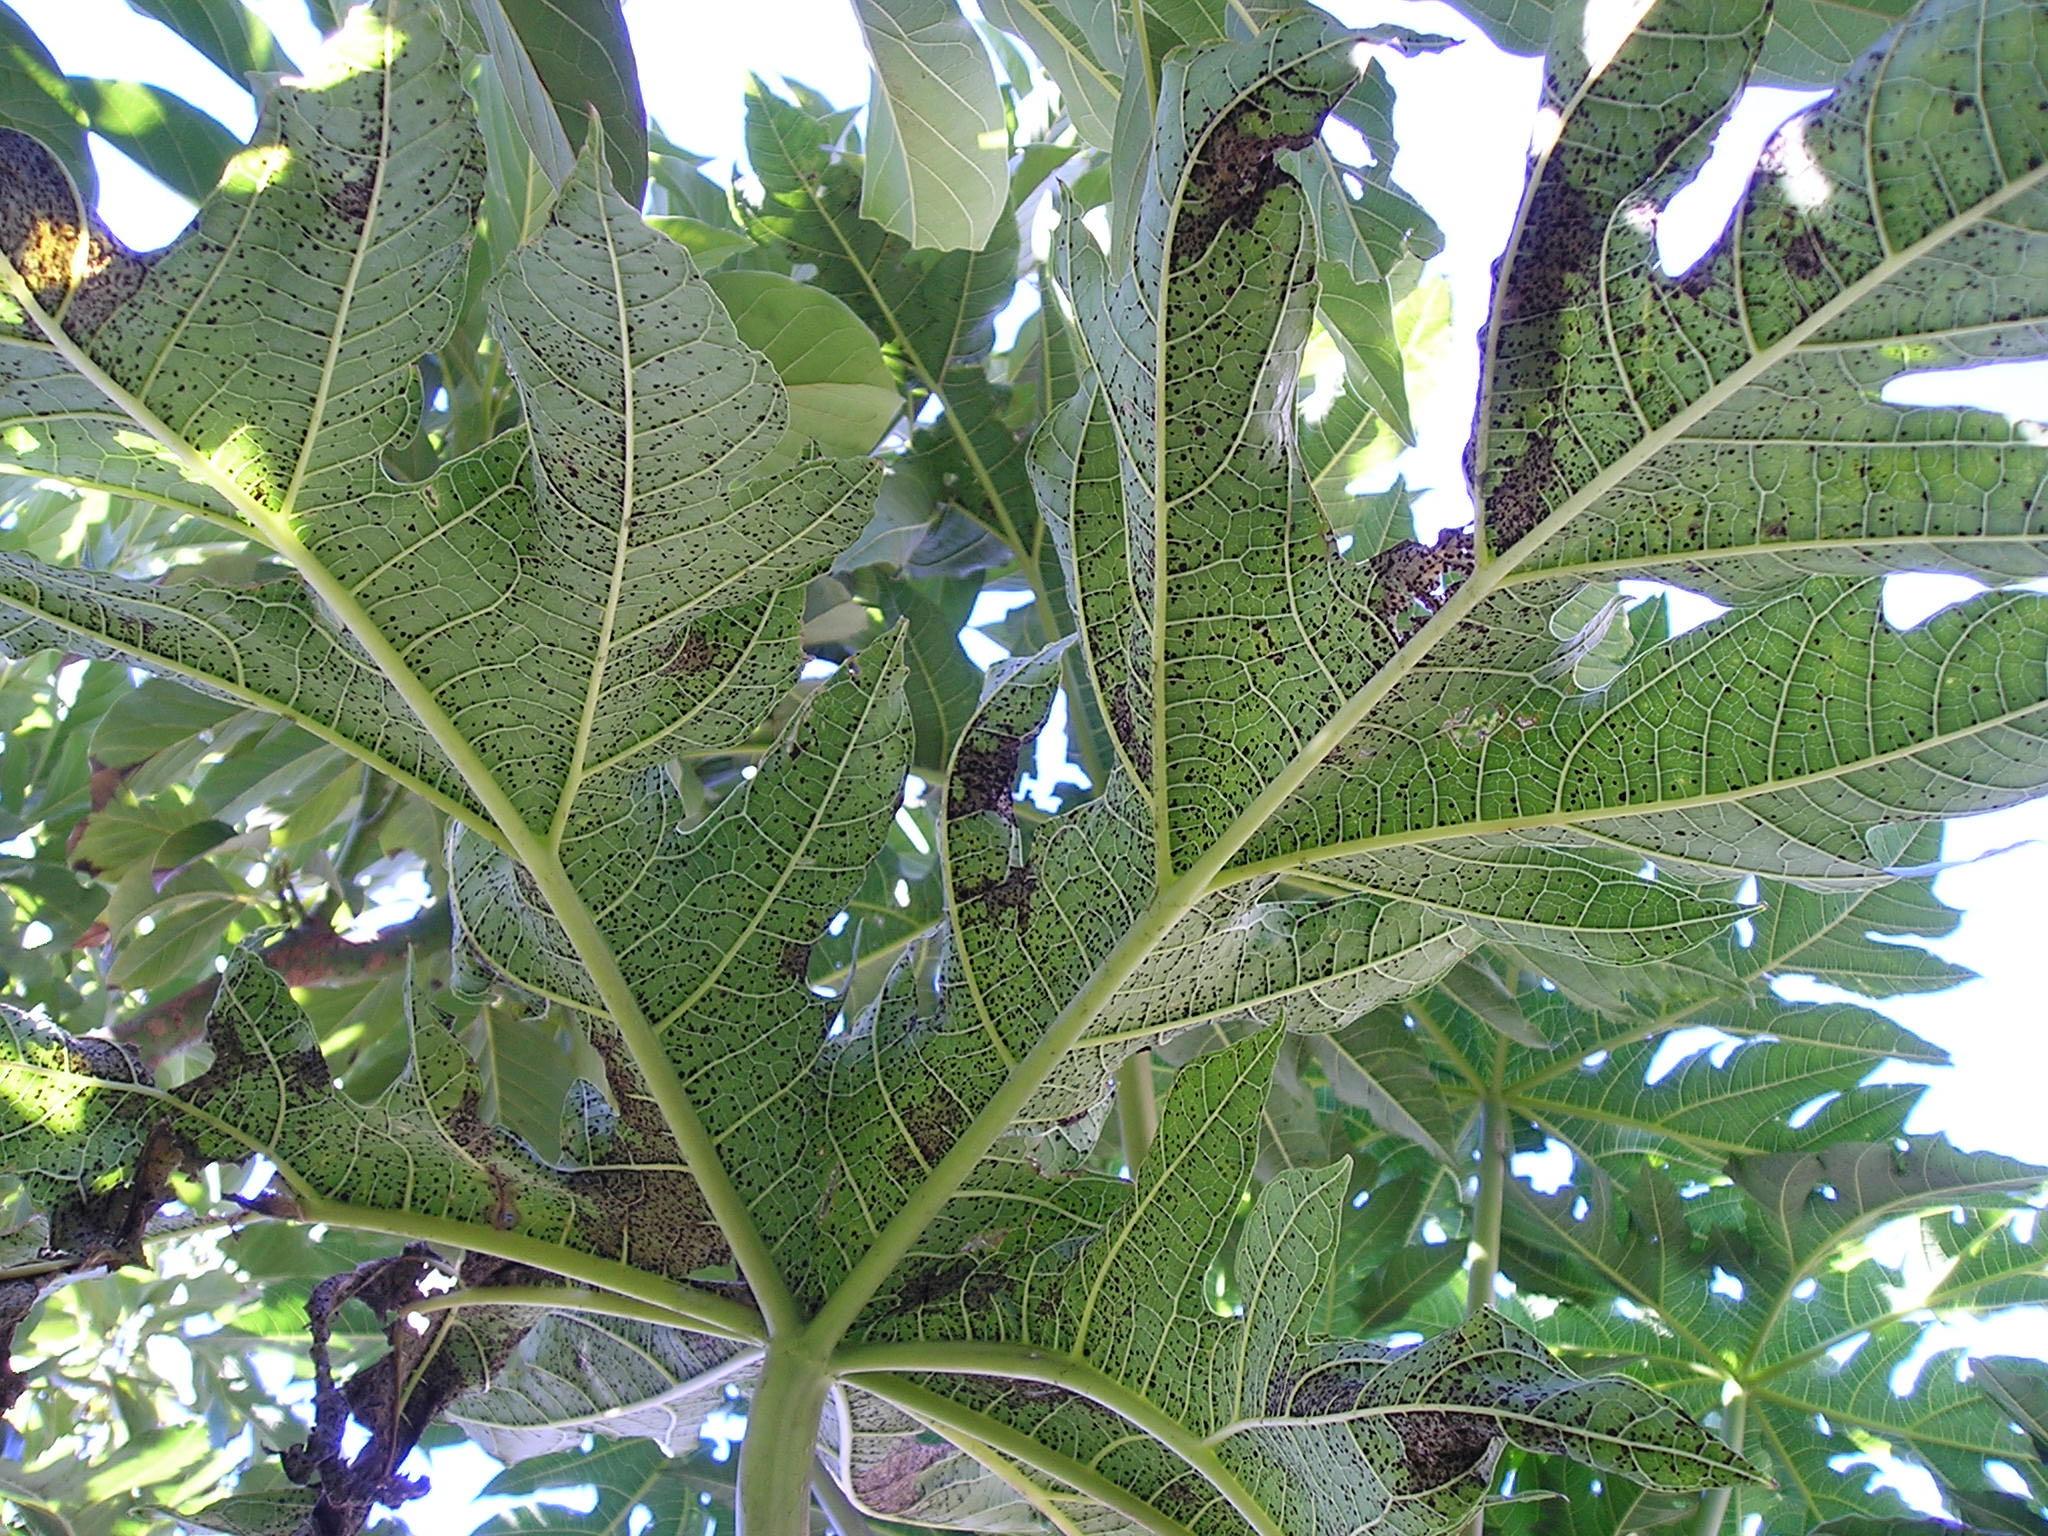 Protecting Pawpaw Plants Against Black Spot Disease